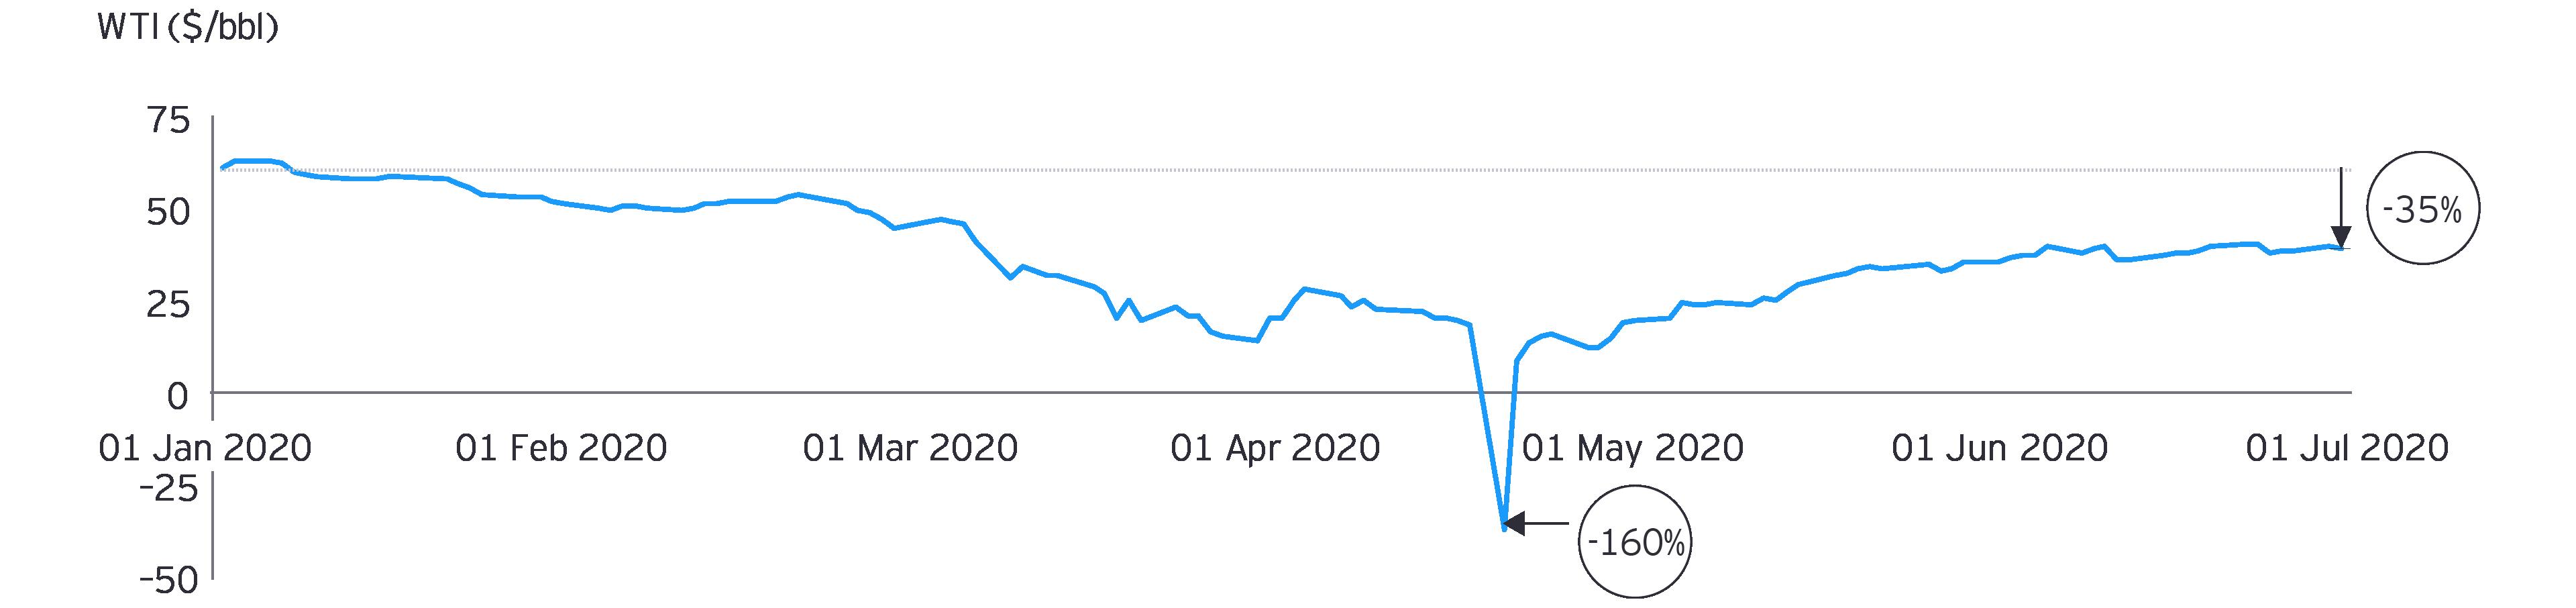 Figure 6: Crude oil price in US$ per bbl